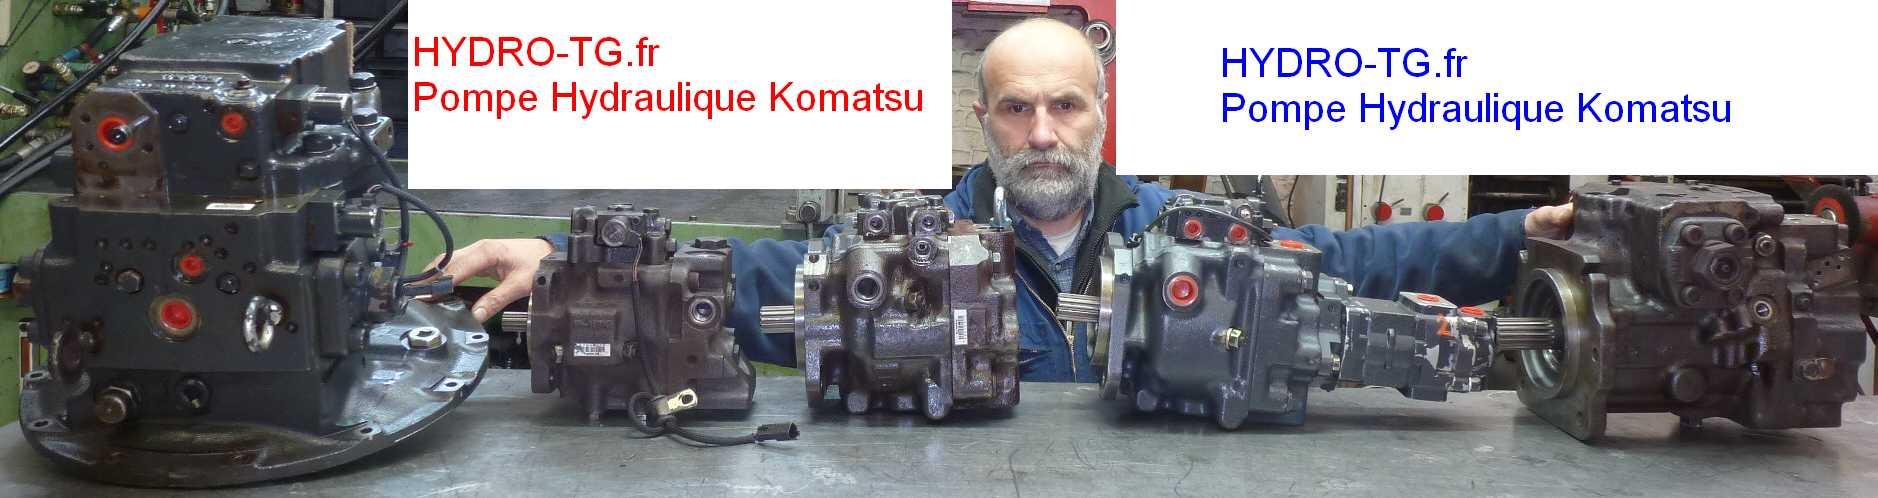 Révision Pompes Hydrauliques Komatsu